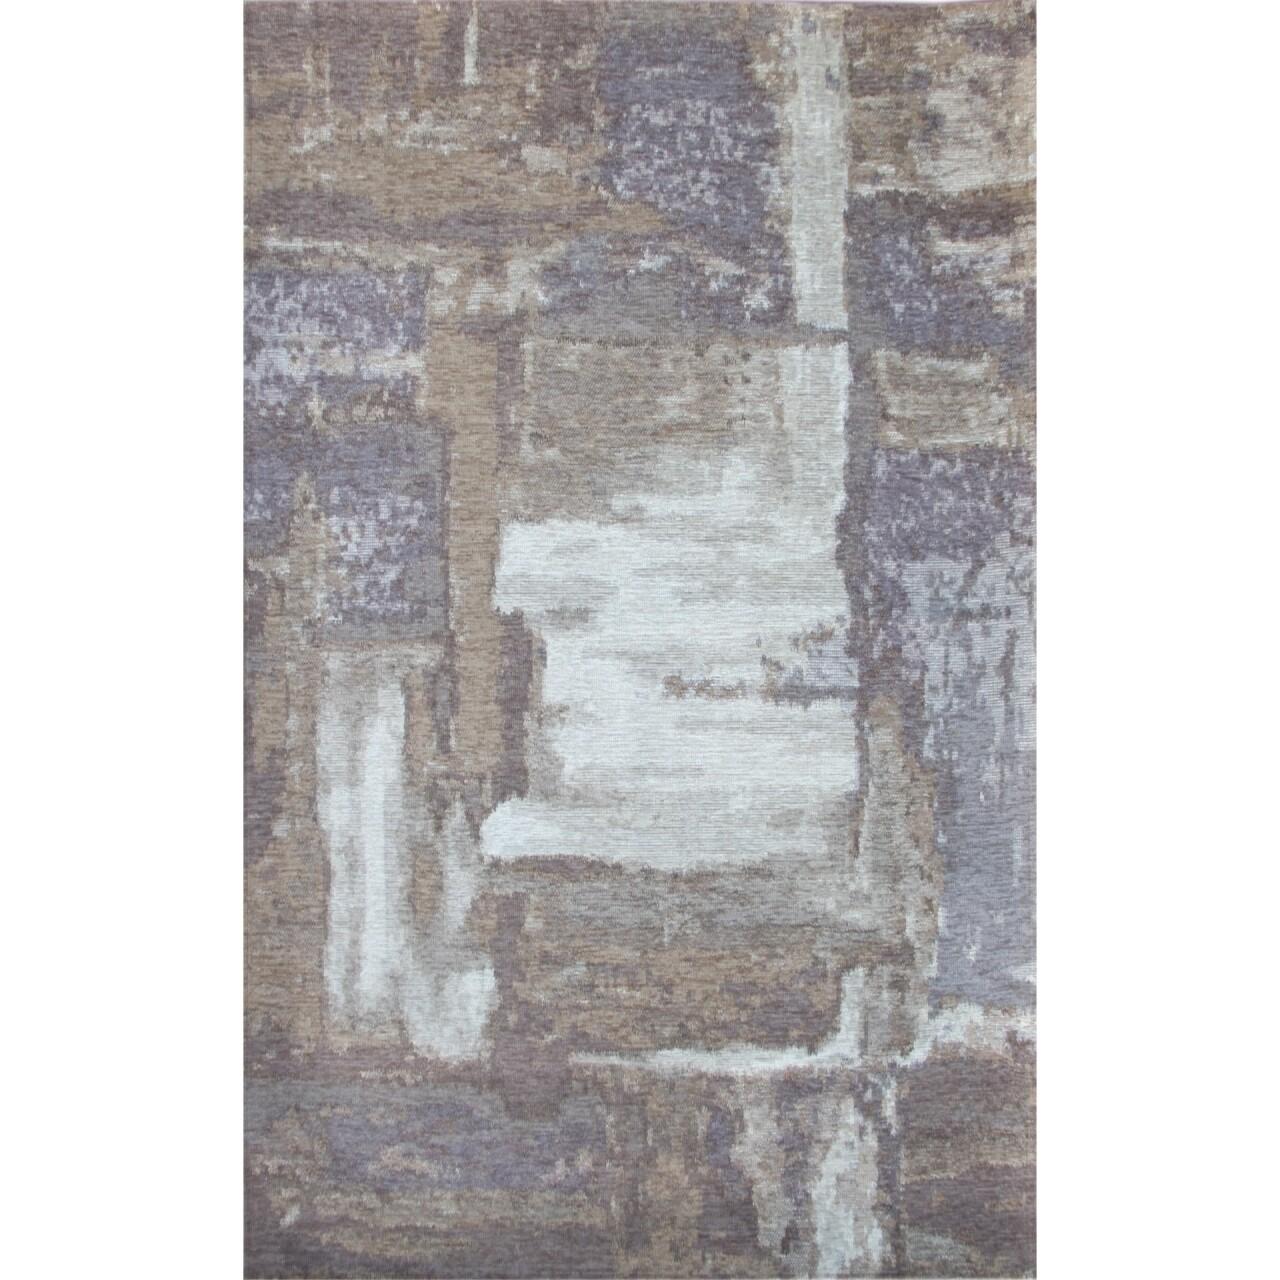 Covor rezistent Eko, SM 01 - Natural XW, 100% acril,  120 x 180 cm